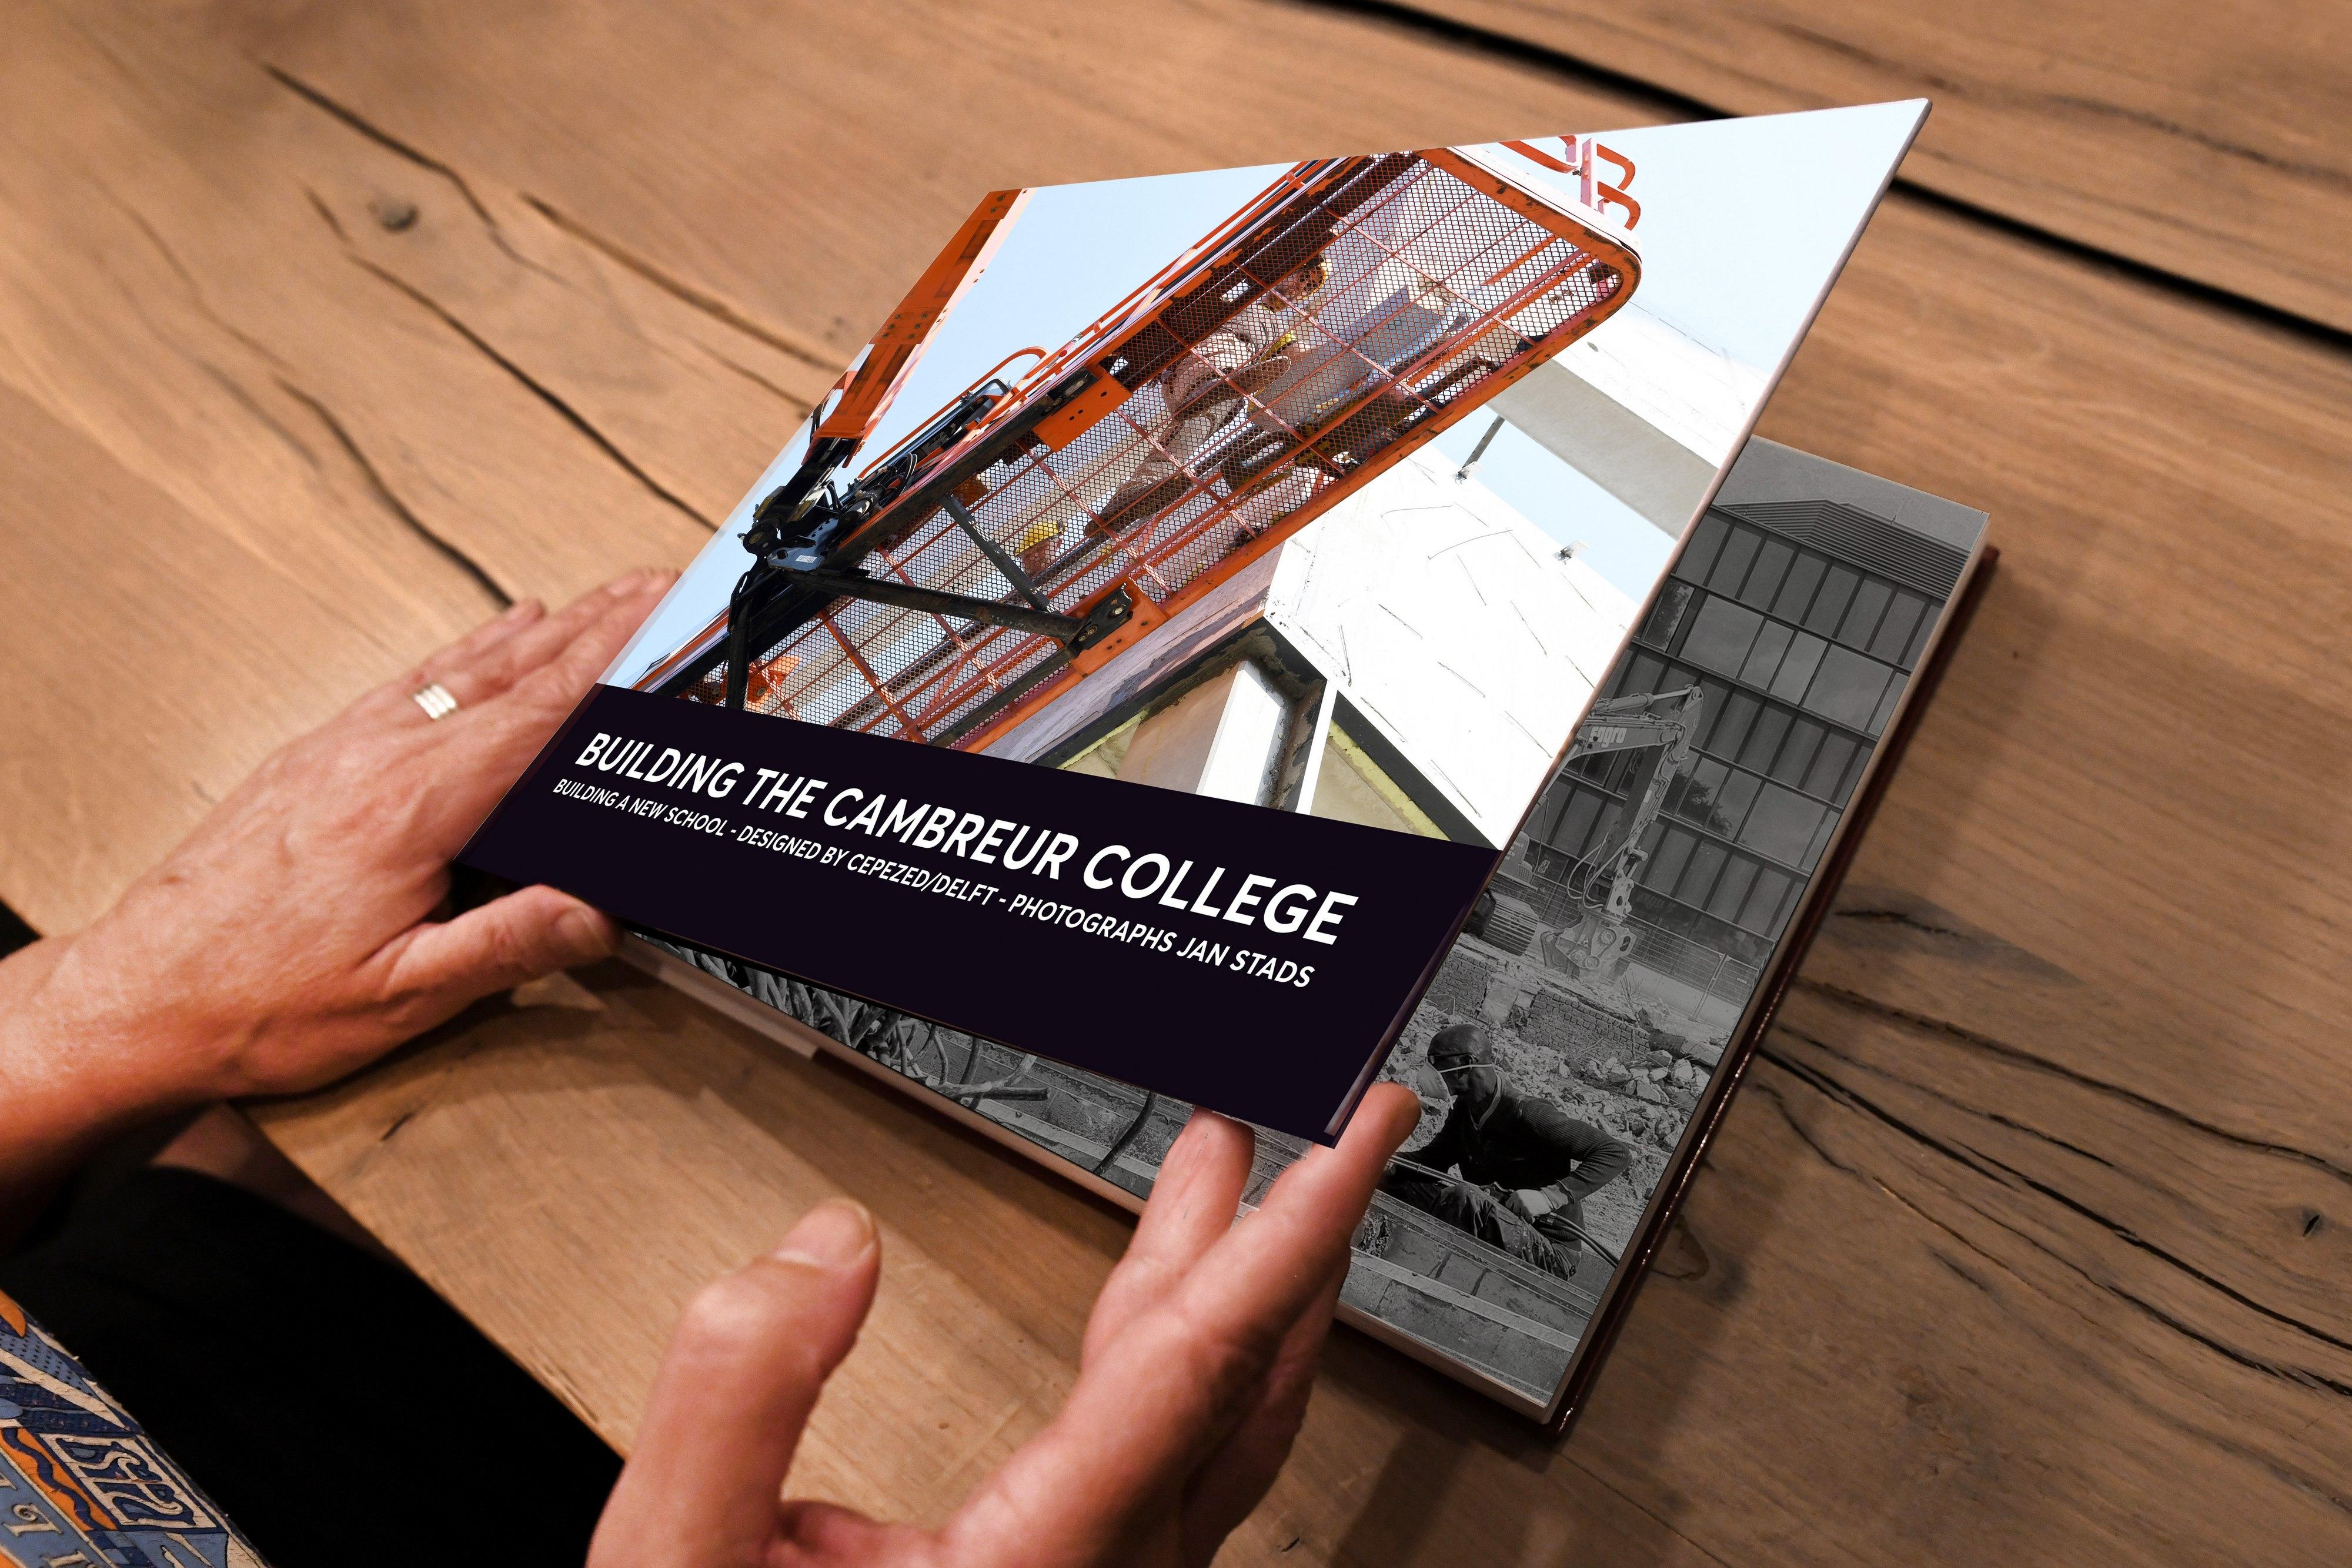 Building the Cambreur College / Historical photos Cambreur College